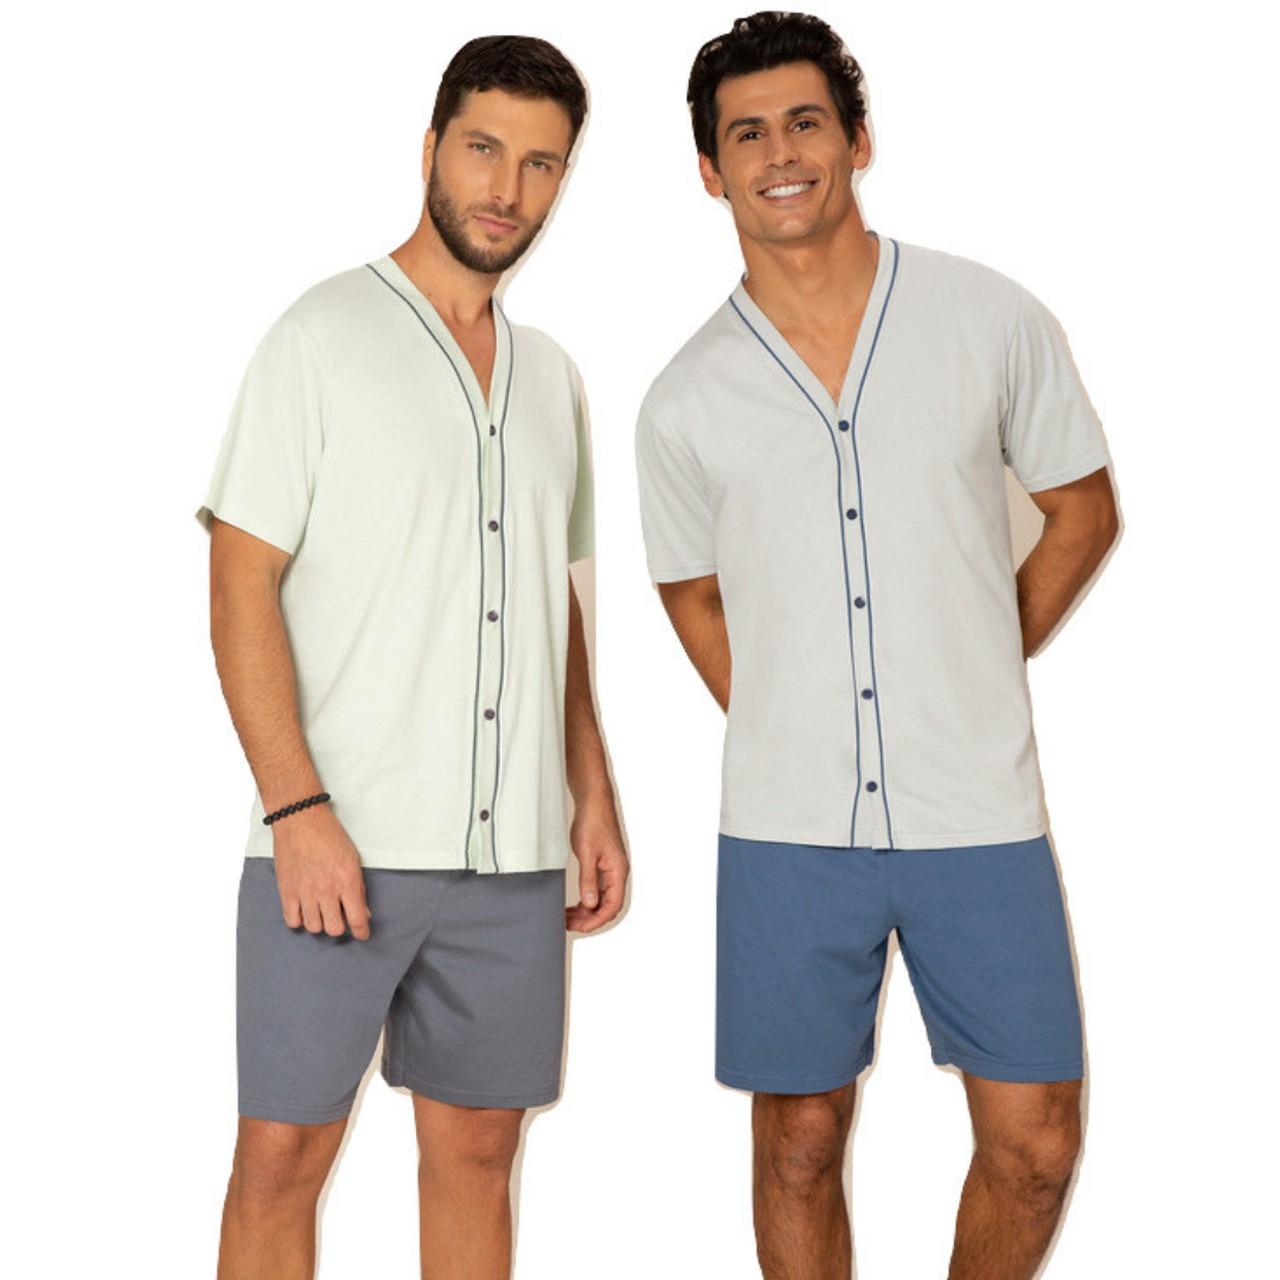 Pijama curto masculino blusa abertura frontal bermuda homem